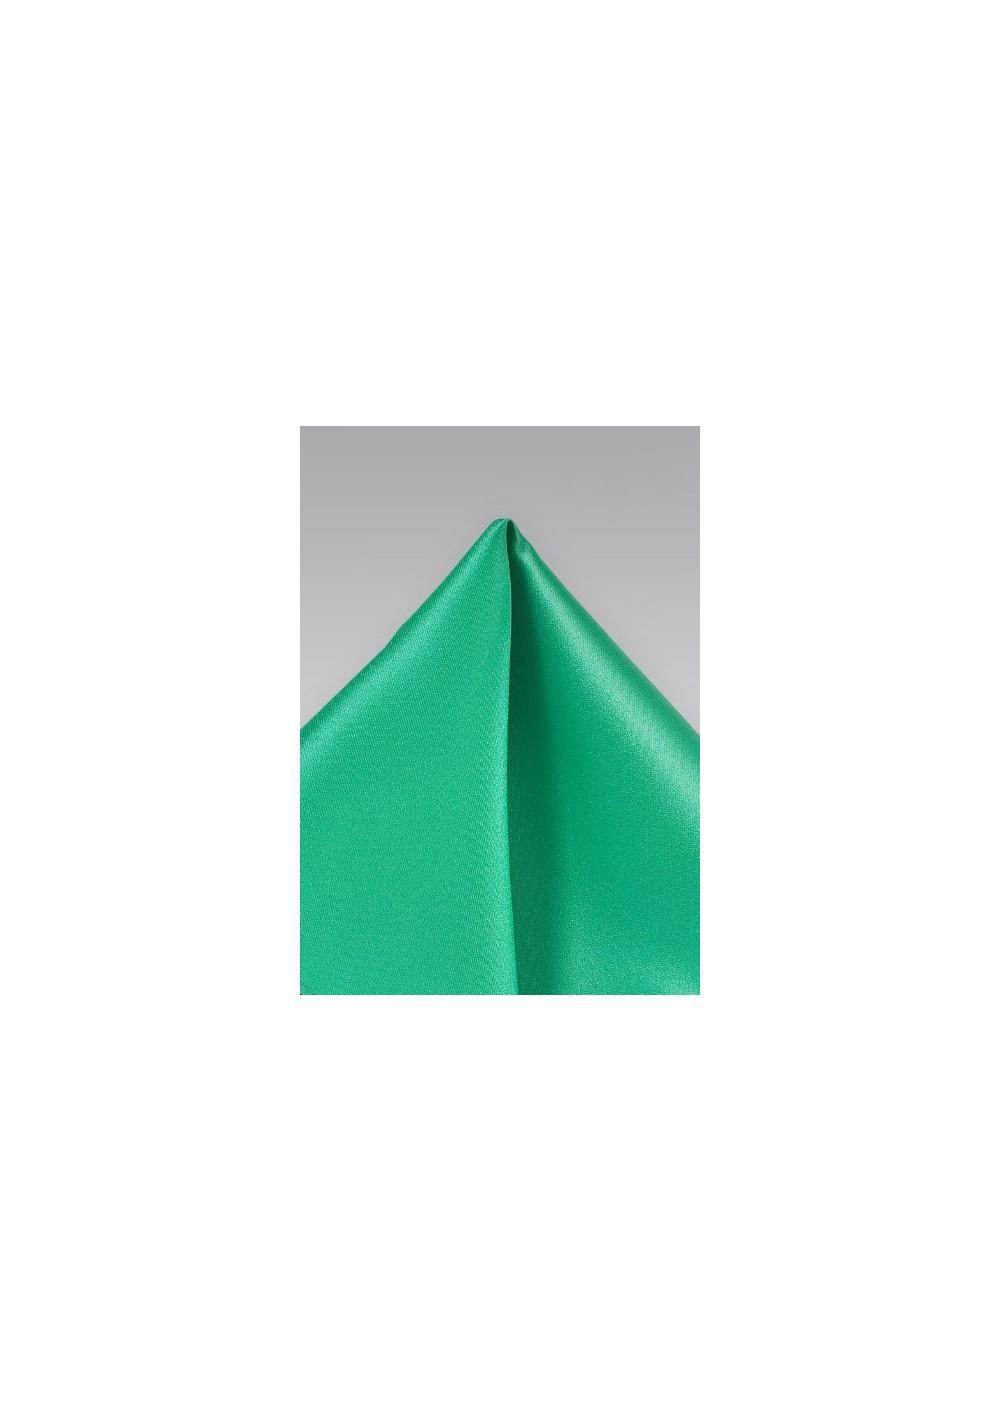 Pocket Squares  - Light green hankie